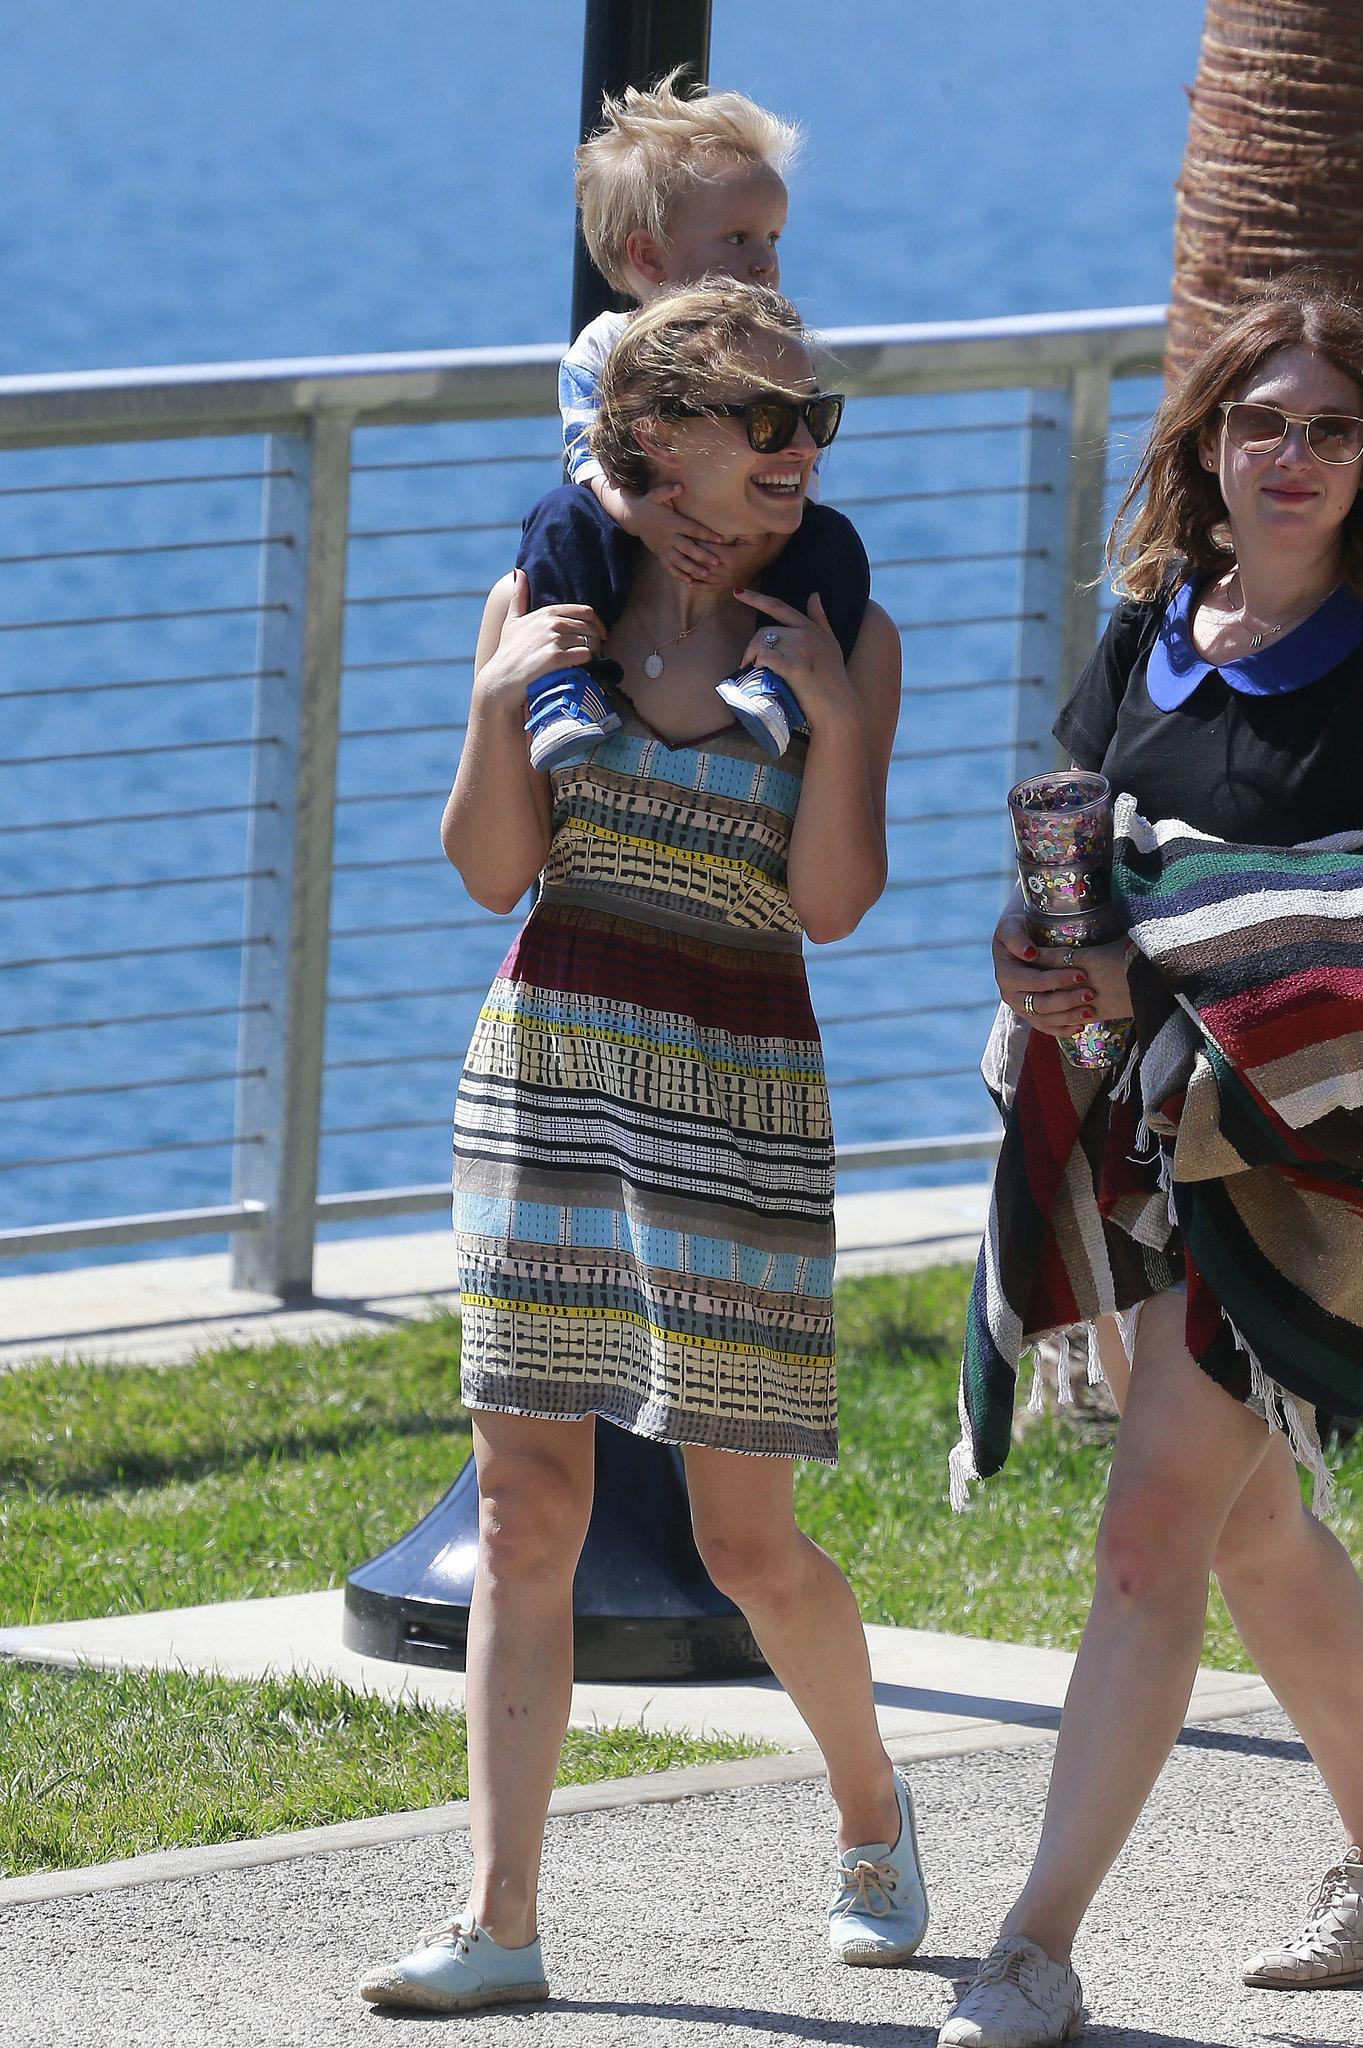 Natalie Portman carried her son on her shoulders.